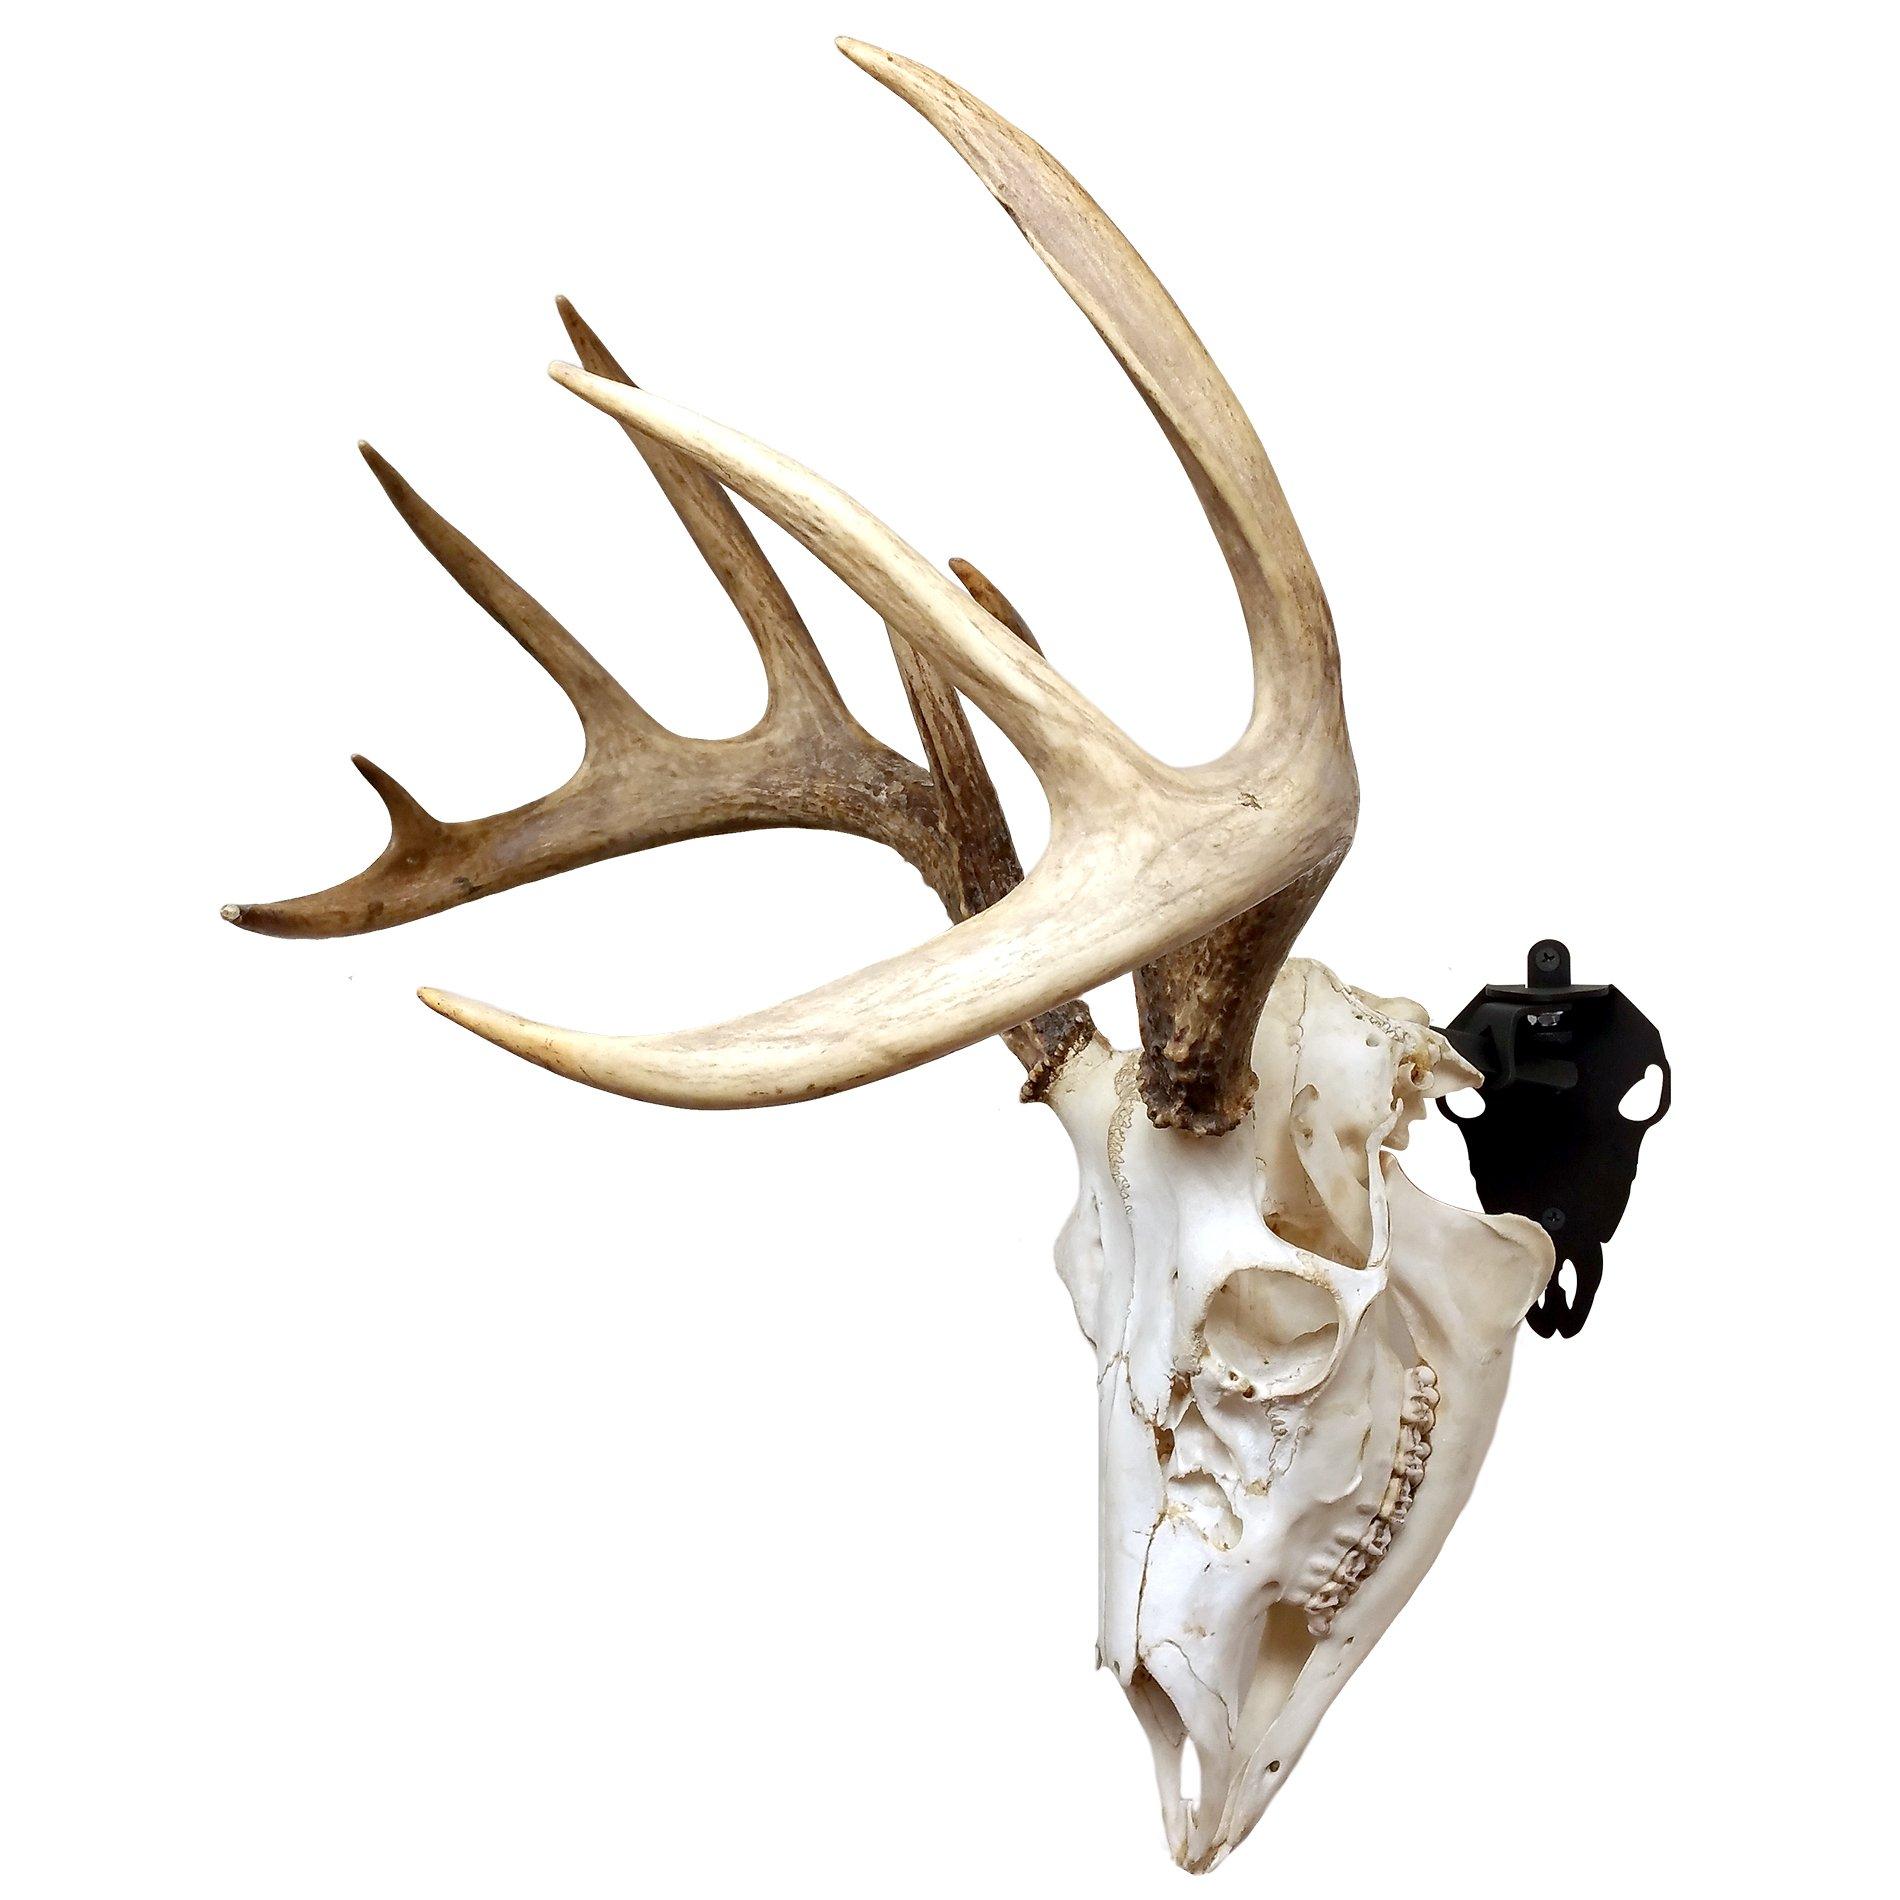 Herron Outdoors P123601 Skull Whitetail Style Mount, Black by Herron Outdoors (Image #2)